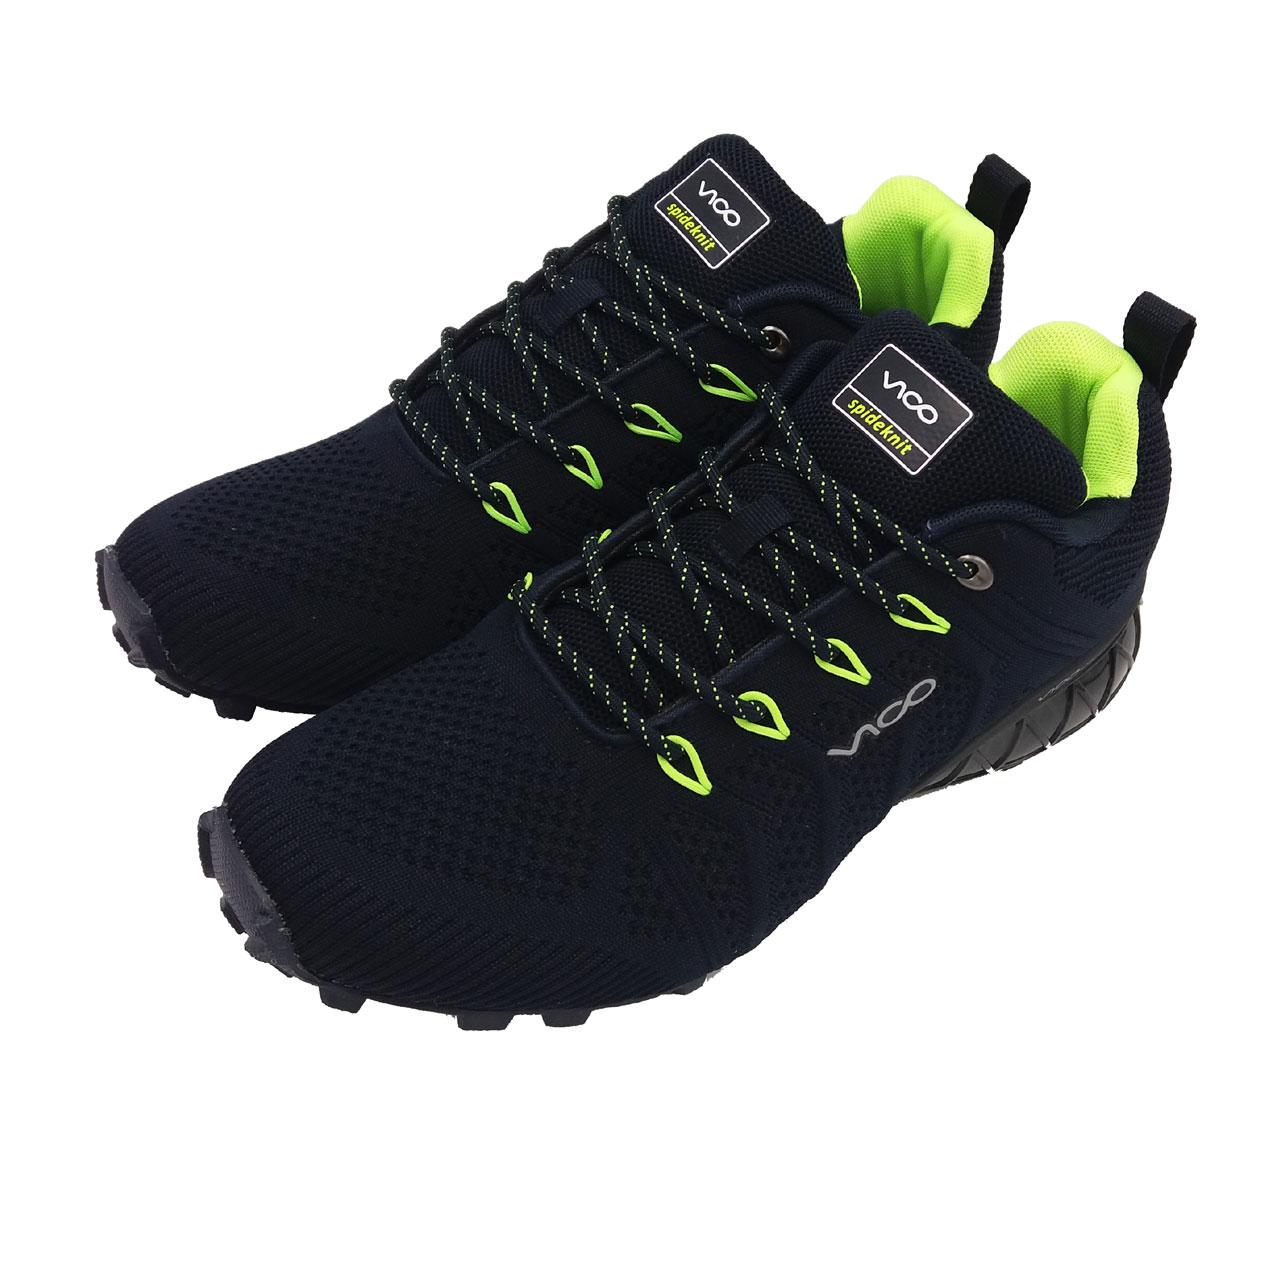 http://zarshoes.ir/uploadfile/file_portal/site_5571_web/file_portal_end/shop/انبار-قدس/product/کفش-ورزشی-5/ویکو-سرمه-ای-سبز/1.jpg